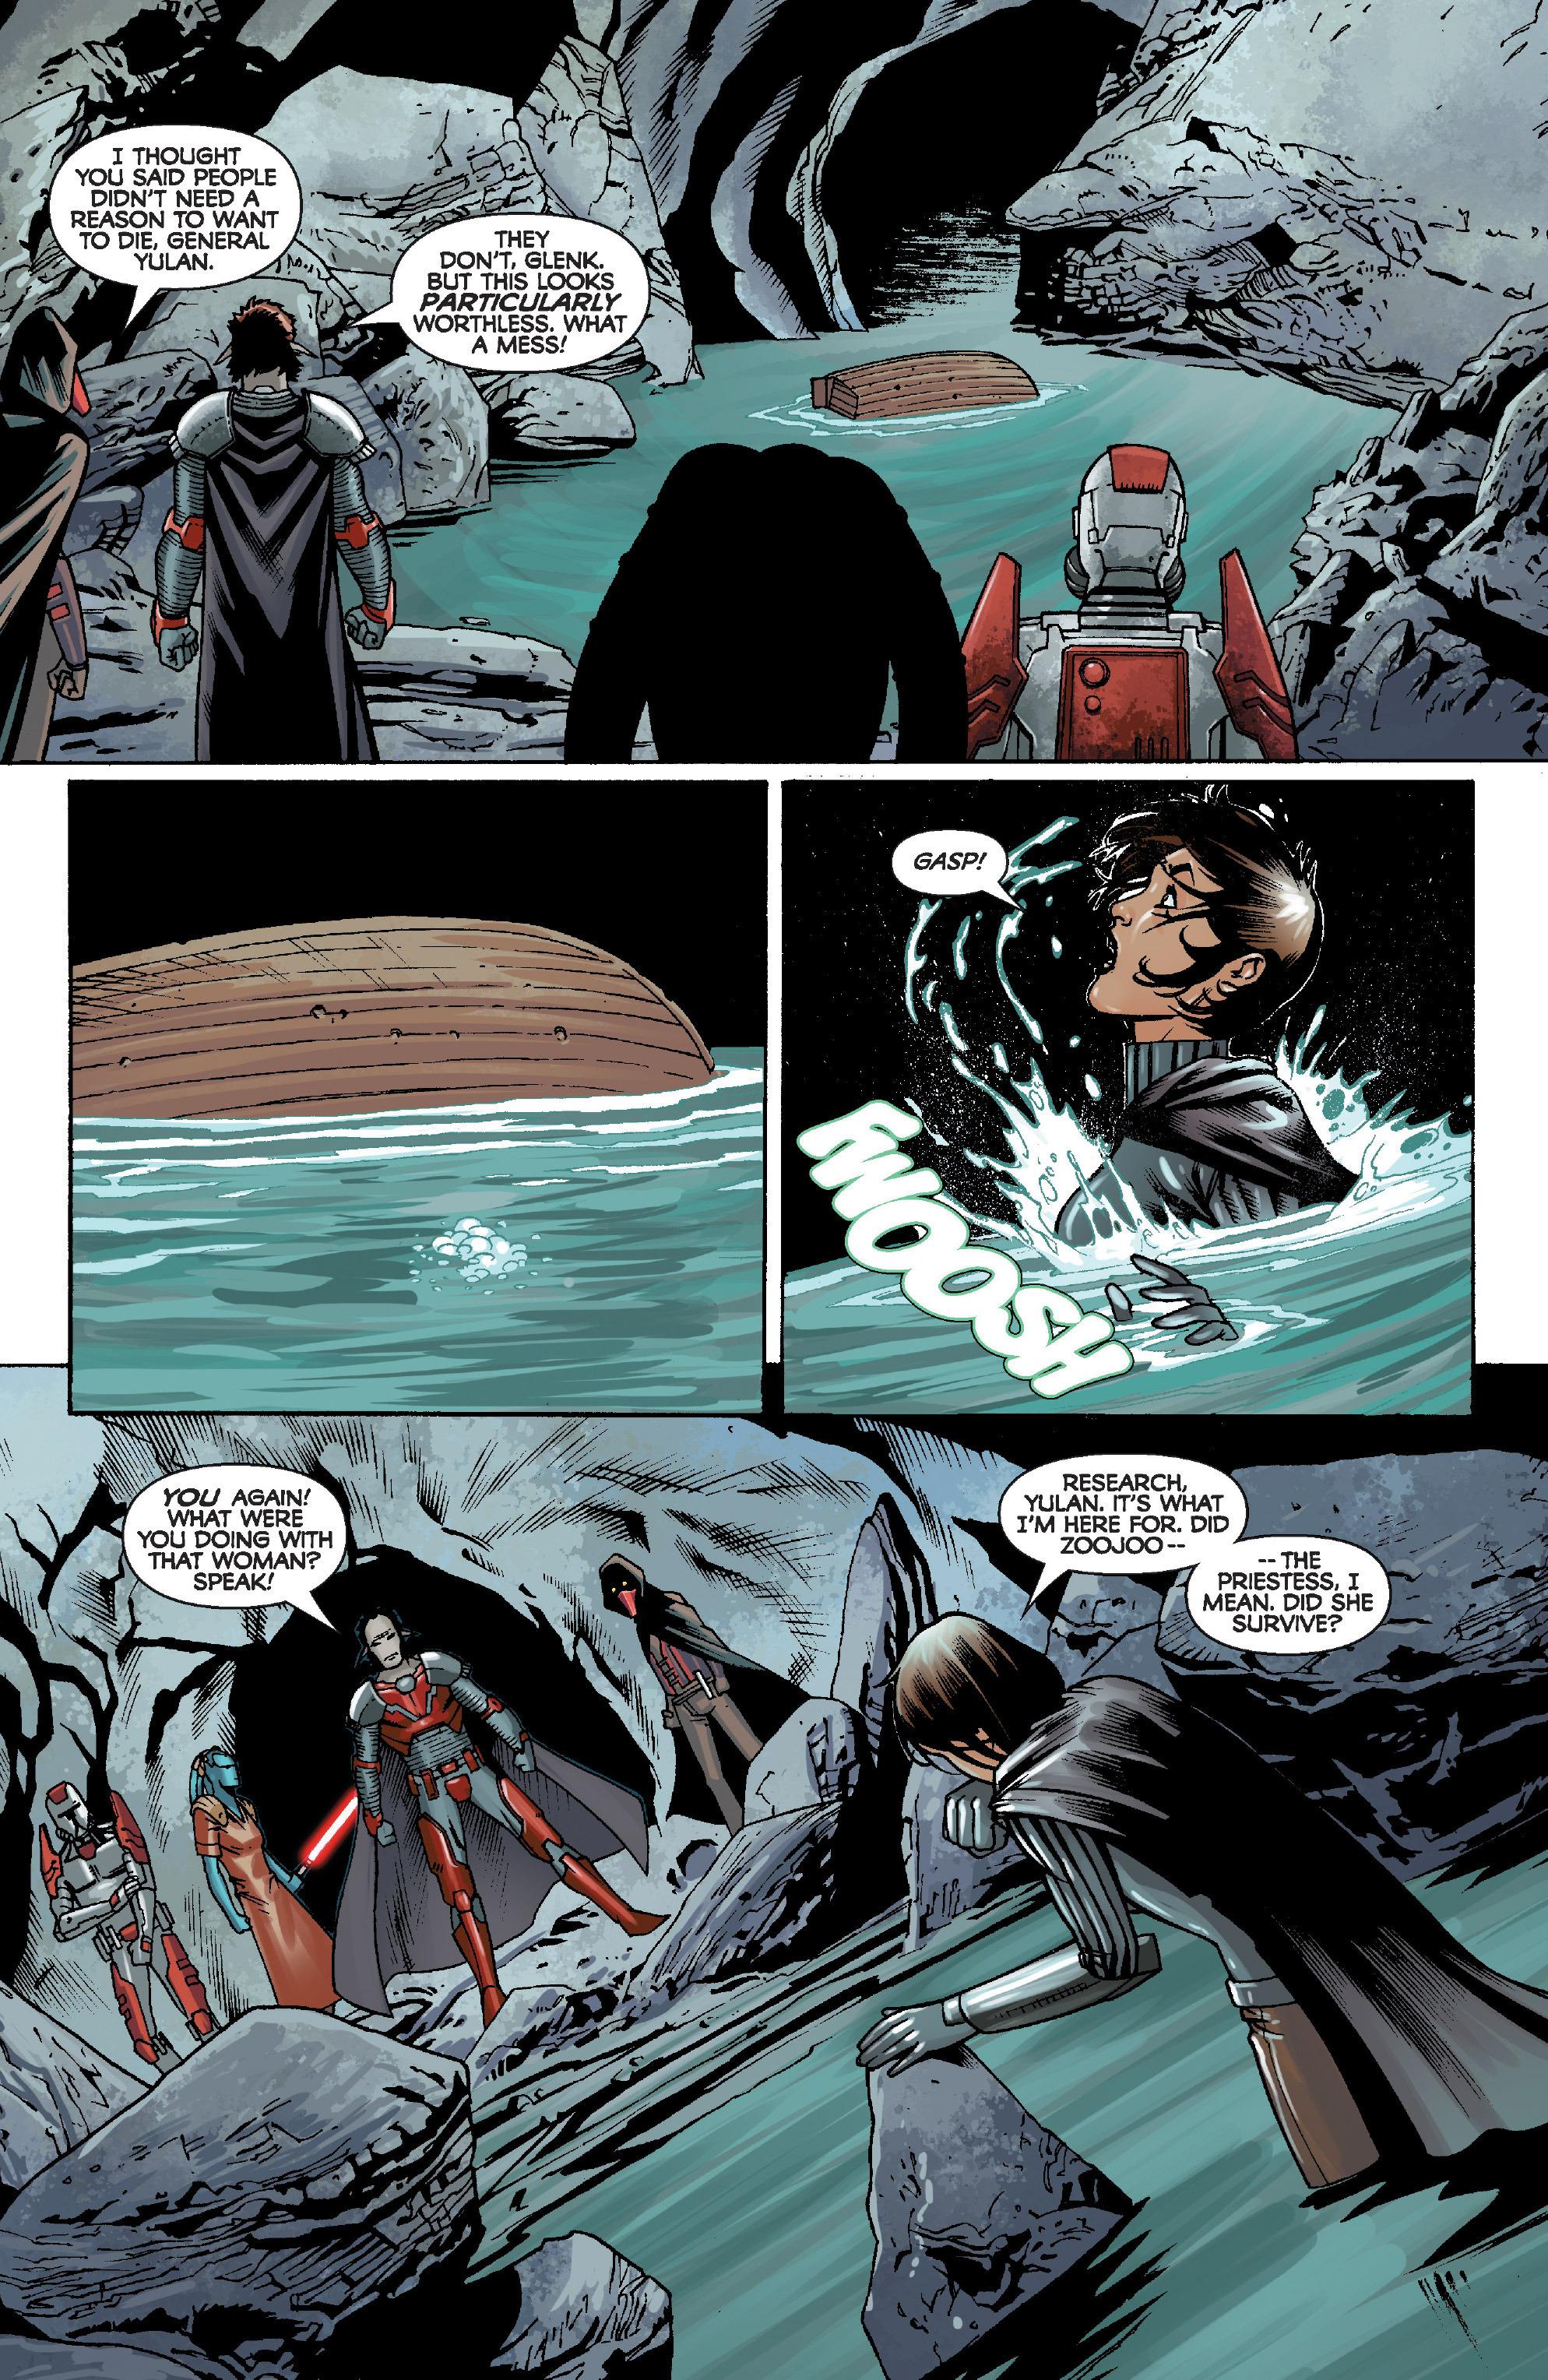 Read online Star Wars: Knight Errant - Escape comic -  Issue #2 - 23